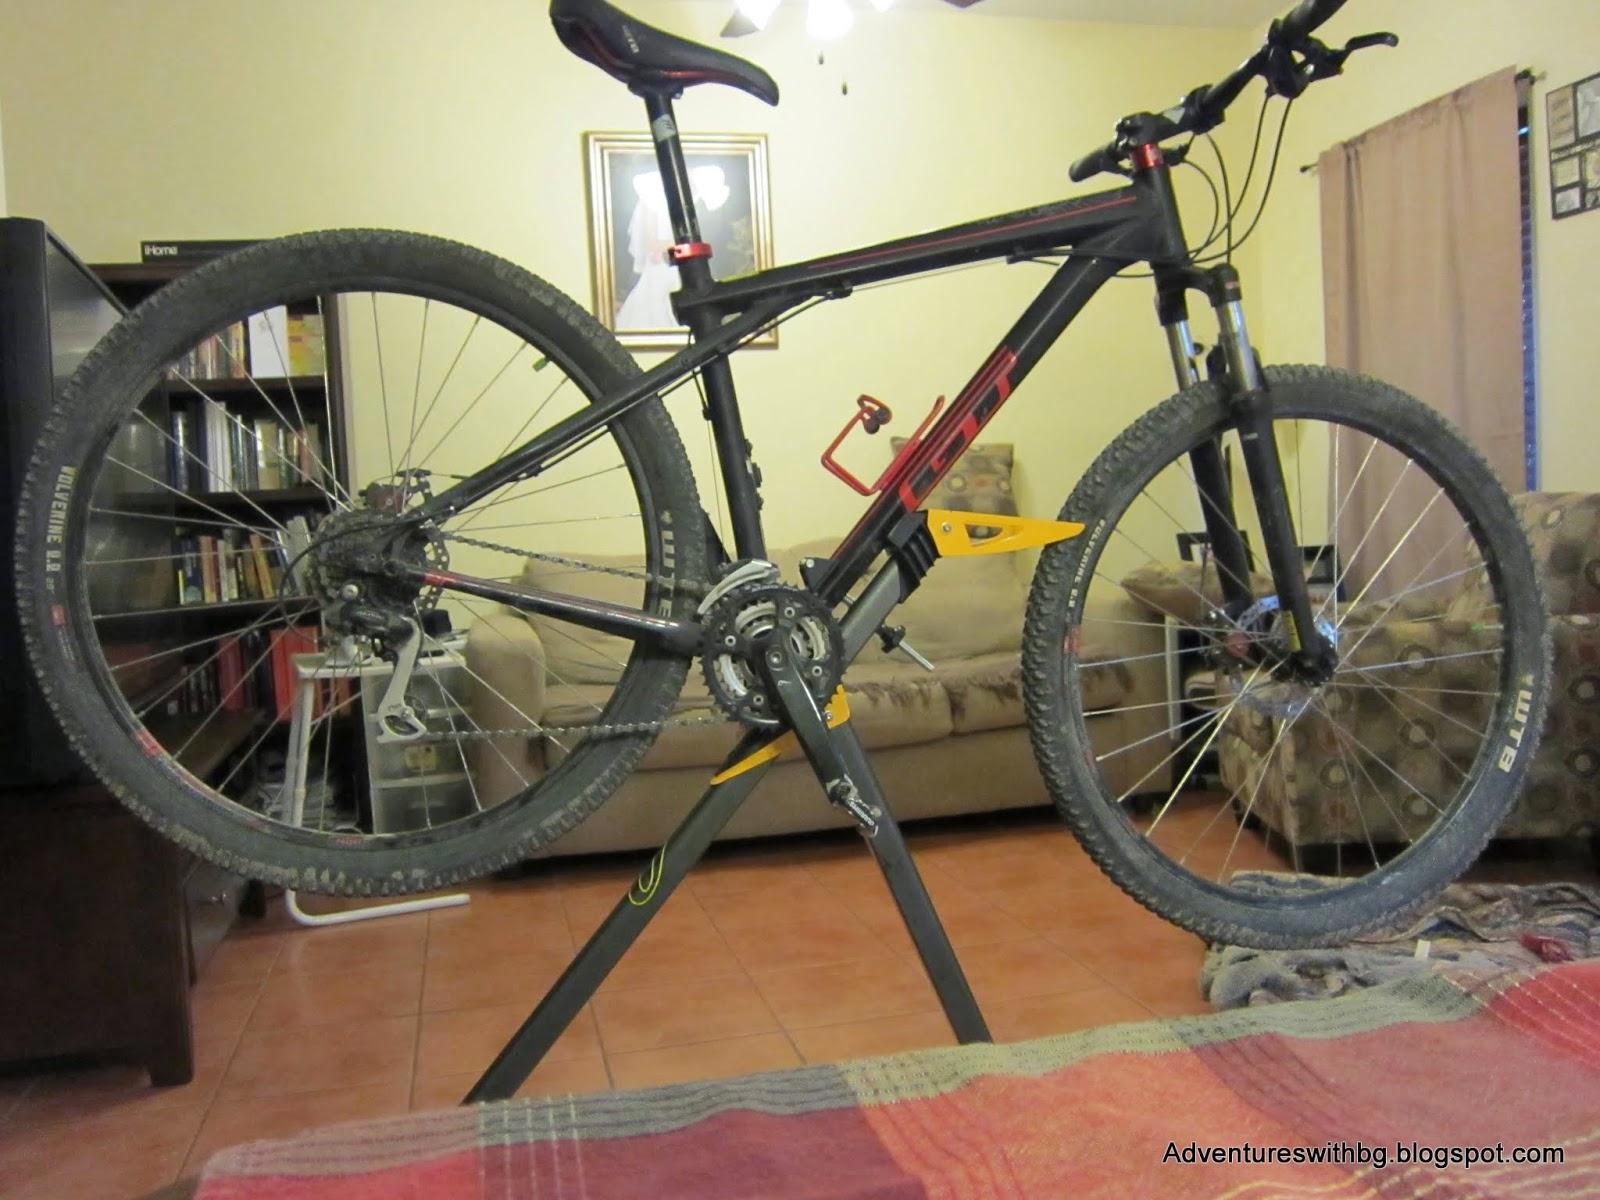 I use a bike stand to make maintenance a little easier